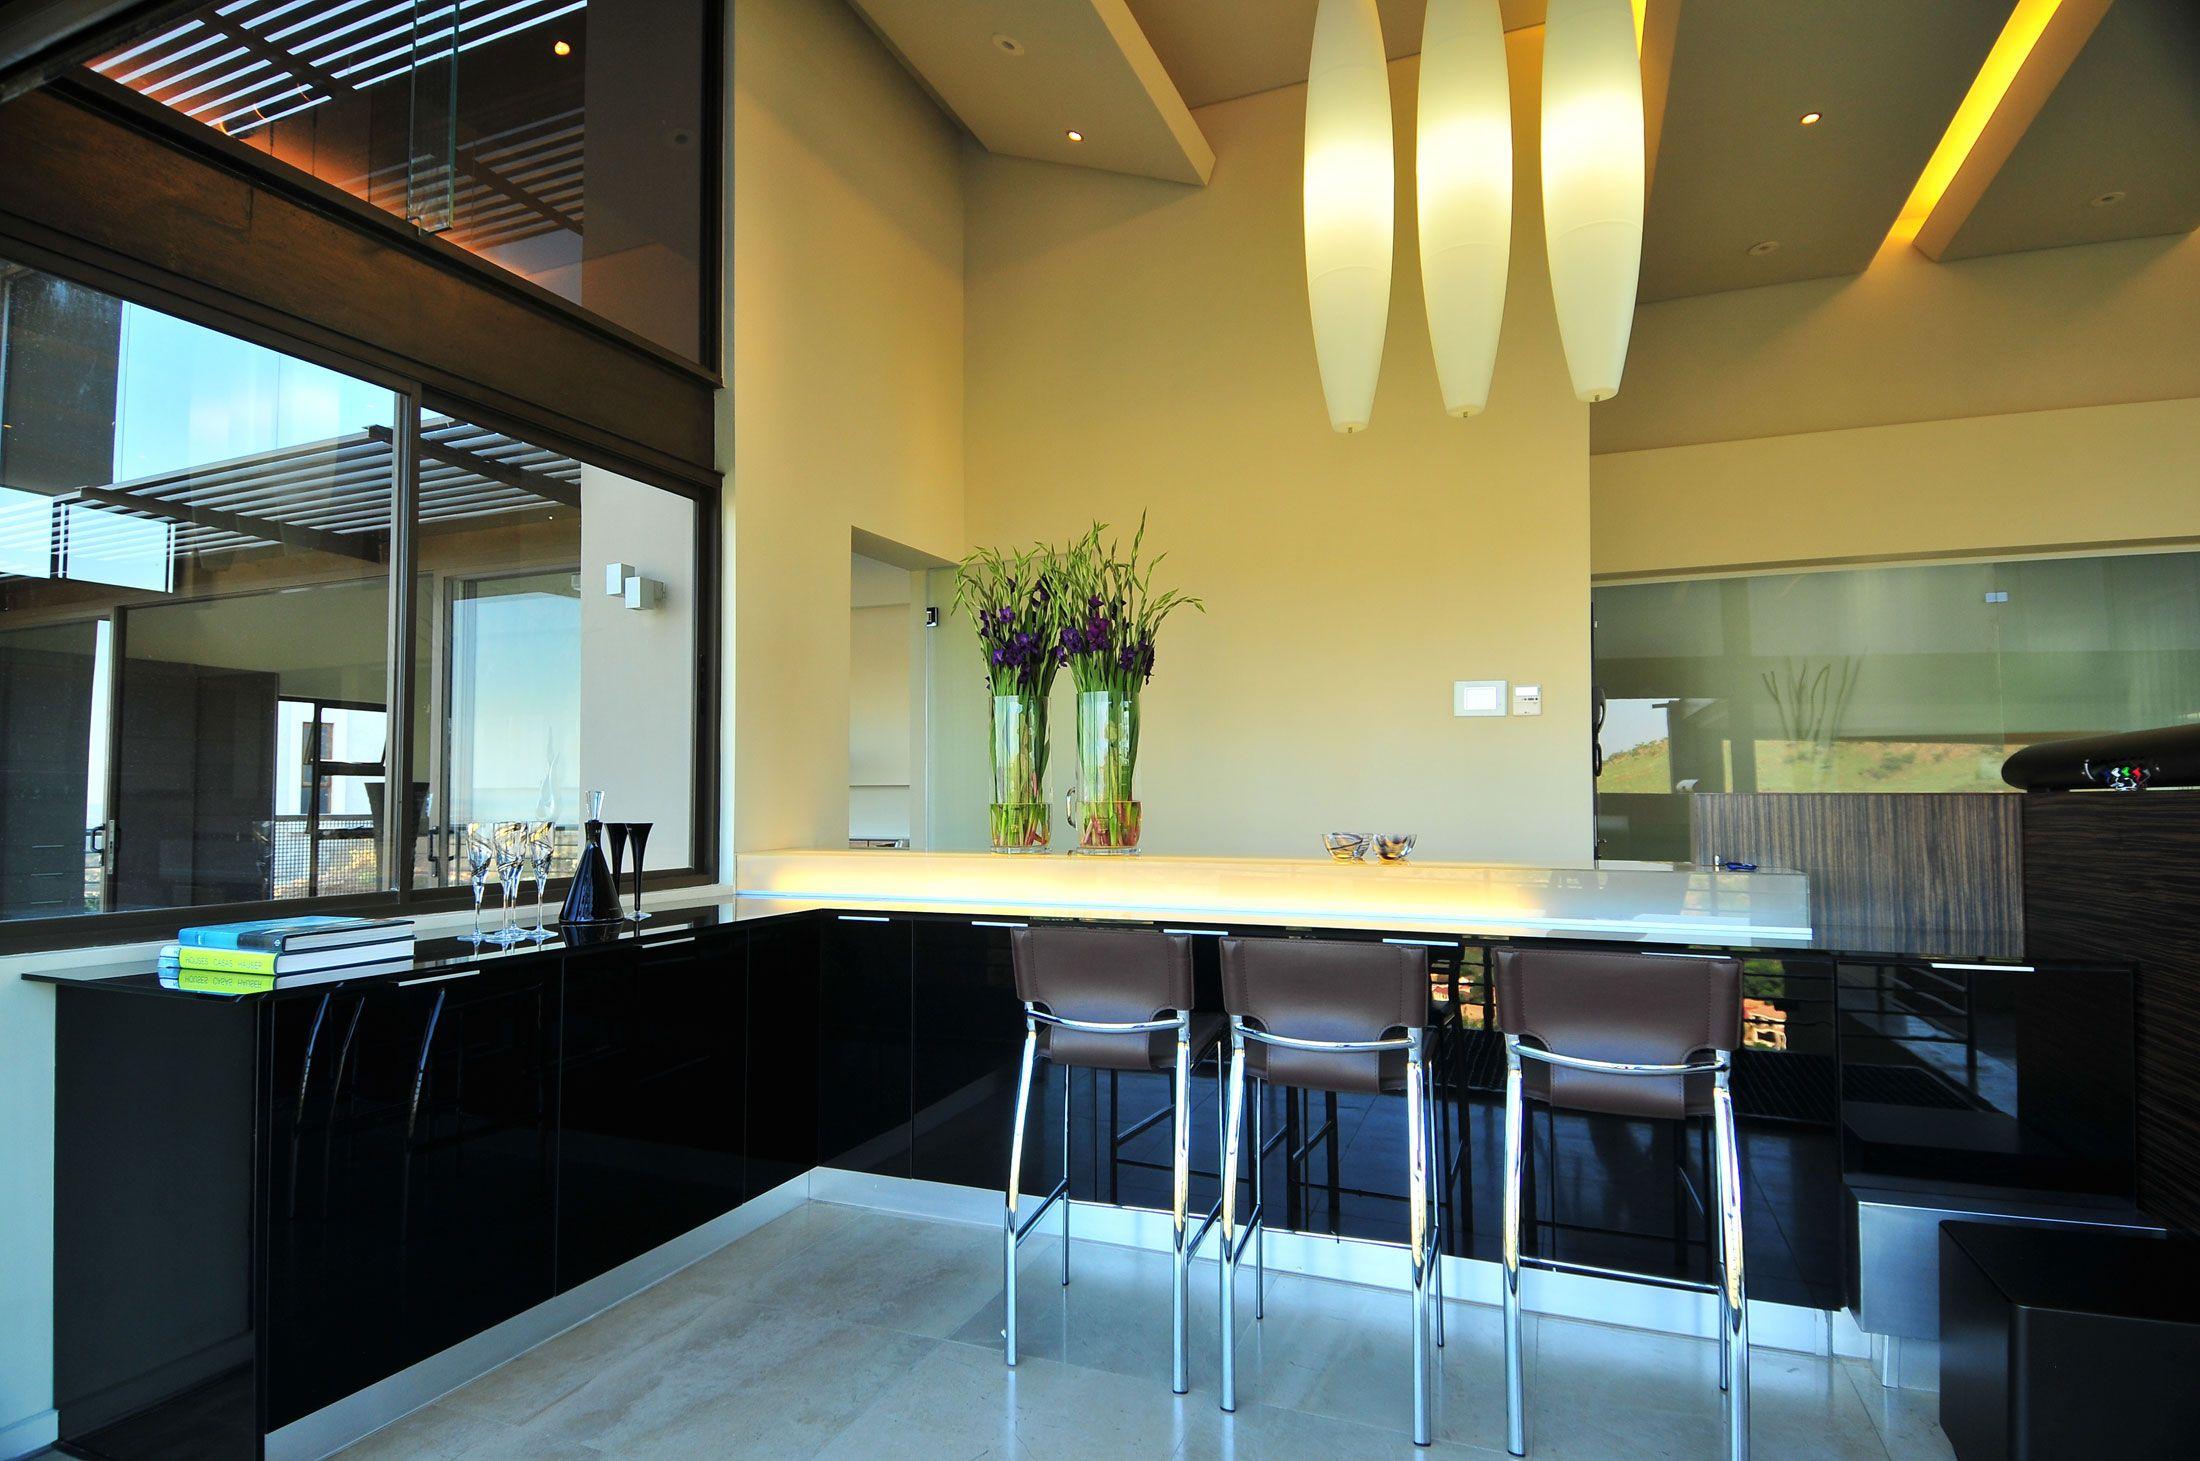 Moderne Anhänger Beleuchtung Design Luxus Küche Deko Ideen